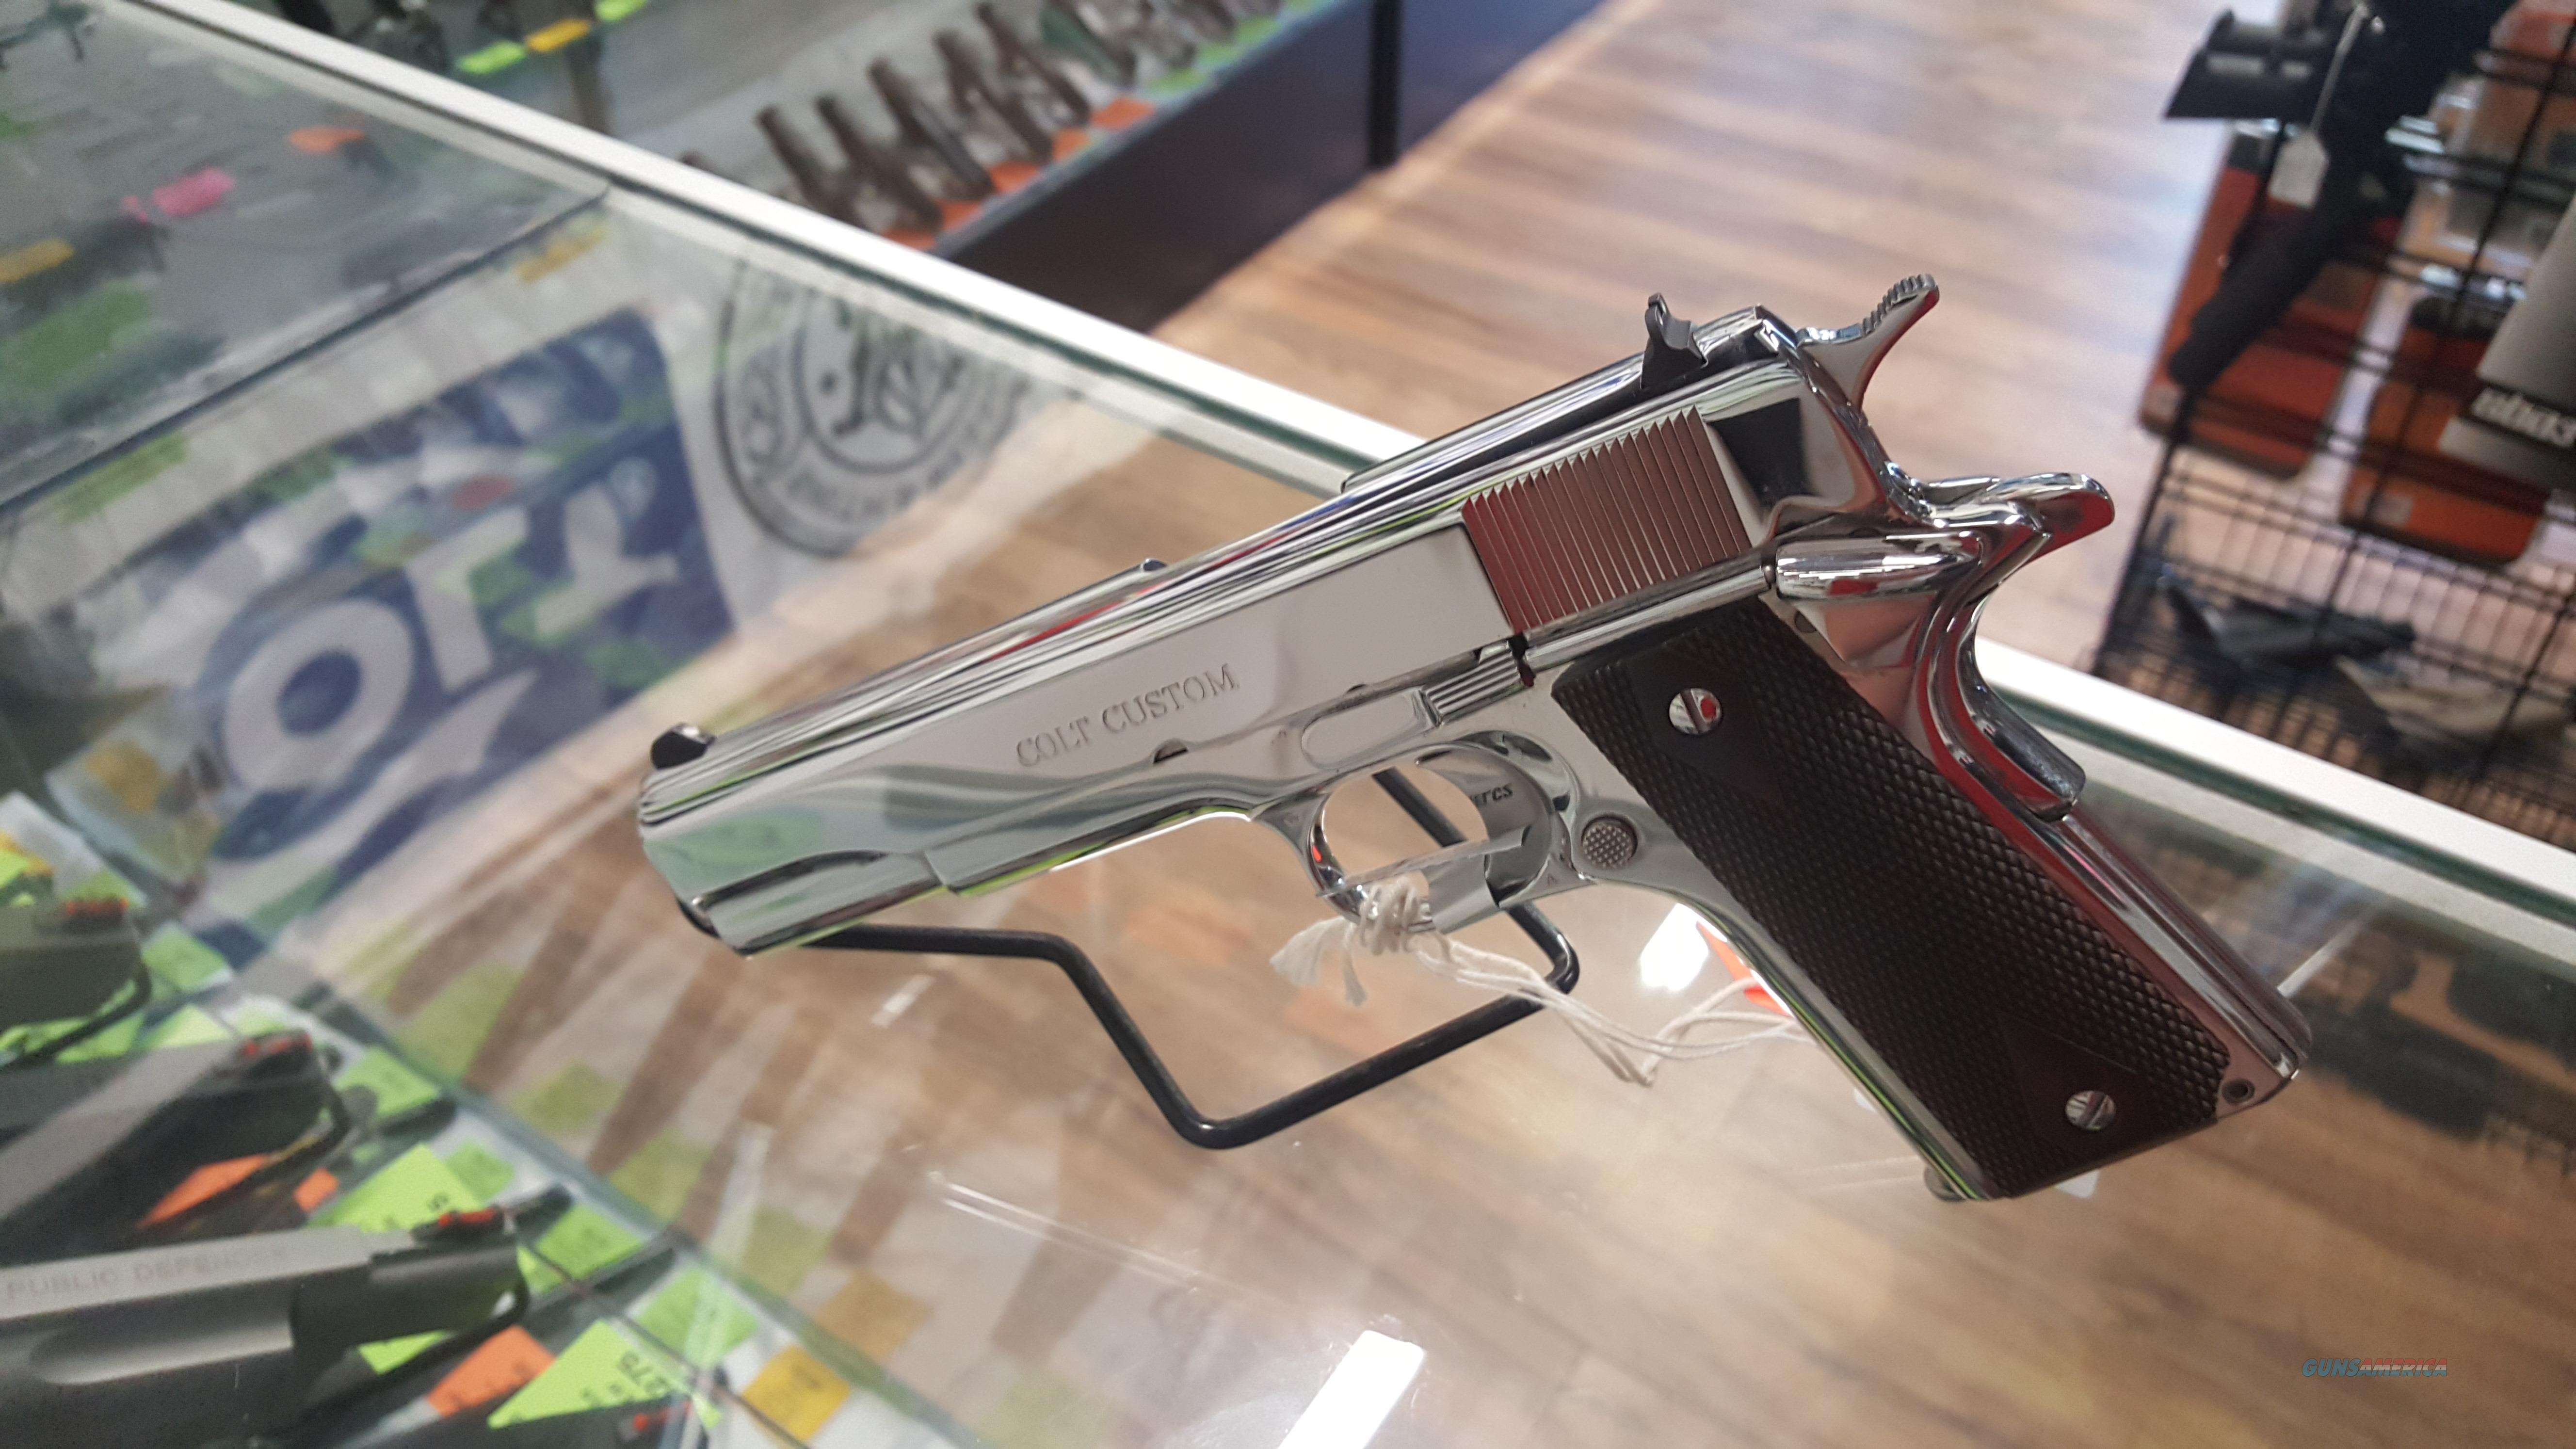 Colt 1911 El Cen 38 Super, Bright Stainless W/extra Mag! NEW  Guns > Pistols > Colt Automatic Pistols (1911 & Var)